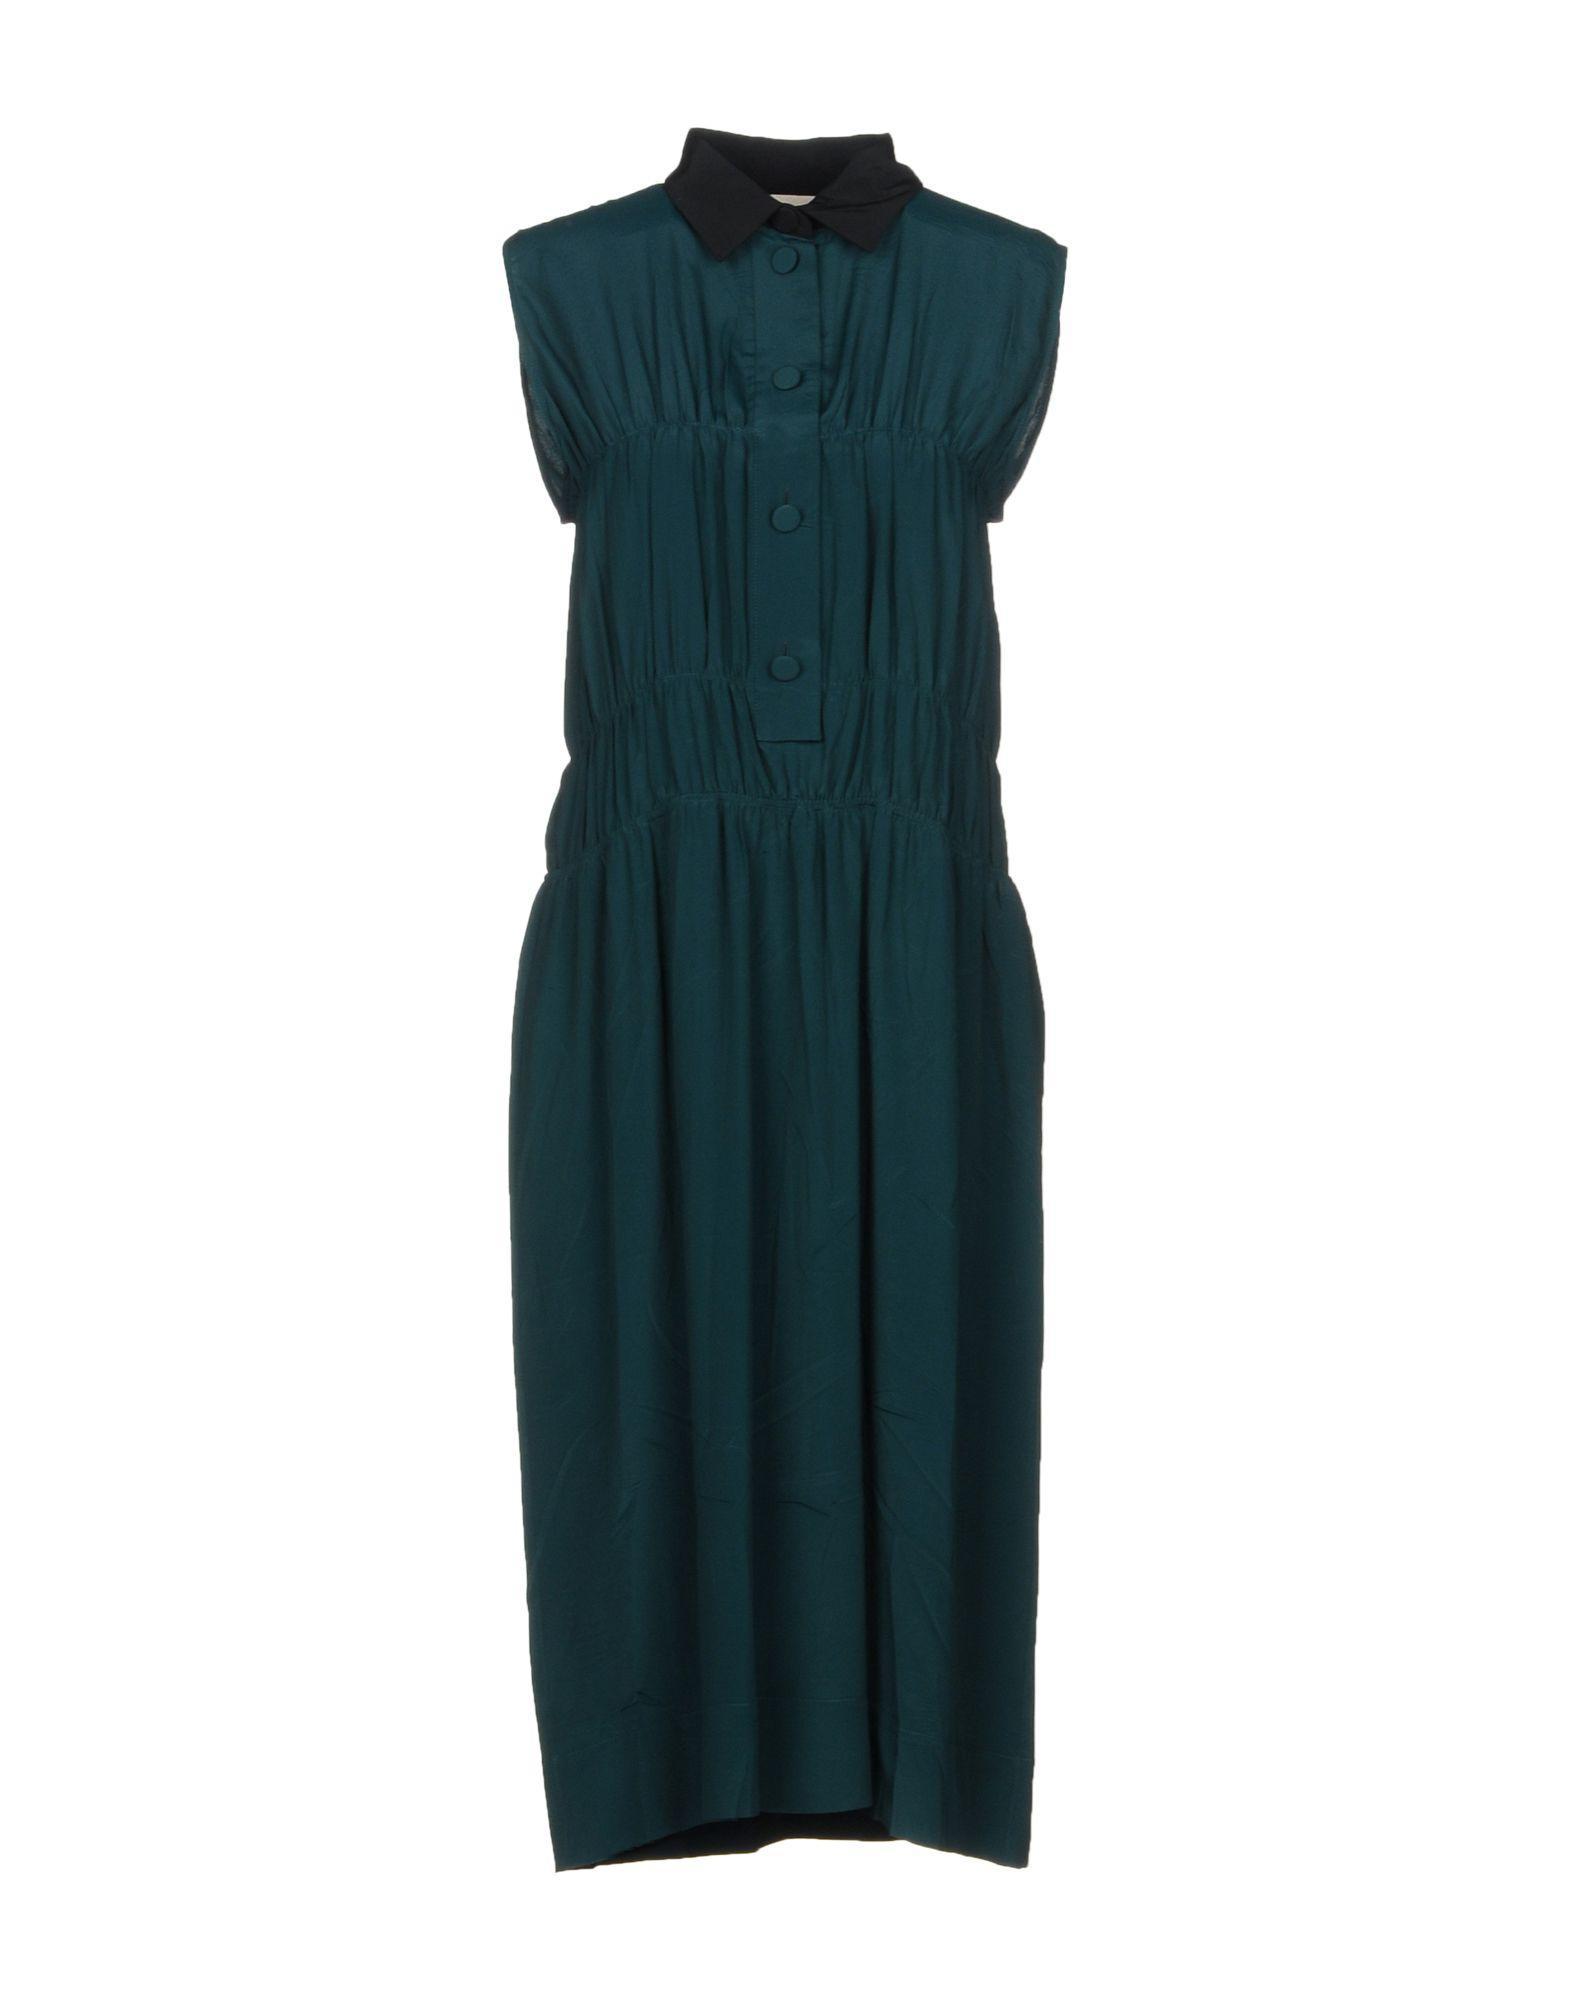 Marni Knee-length Dresses In Emerald Green